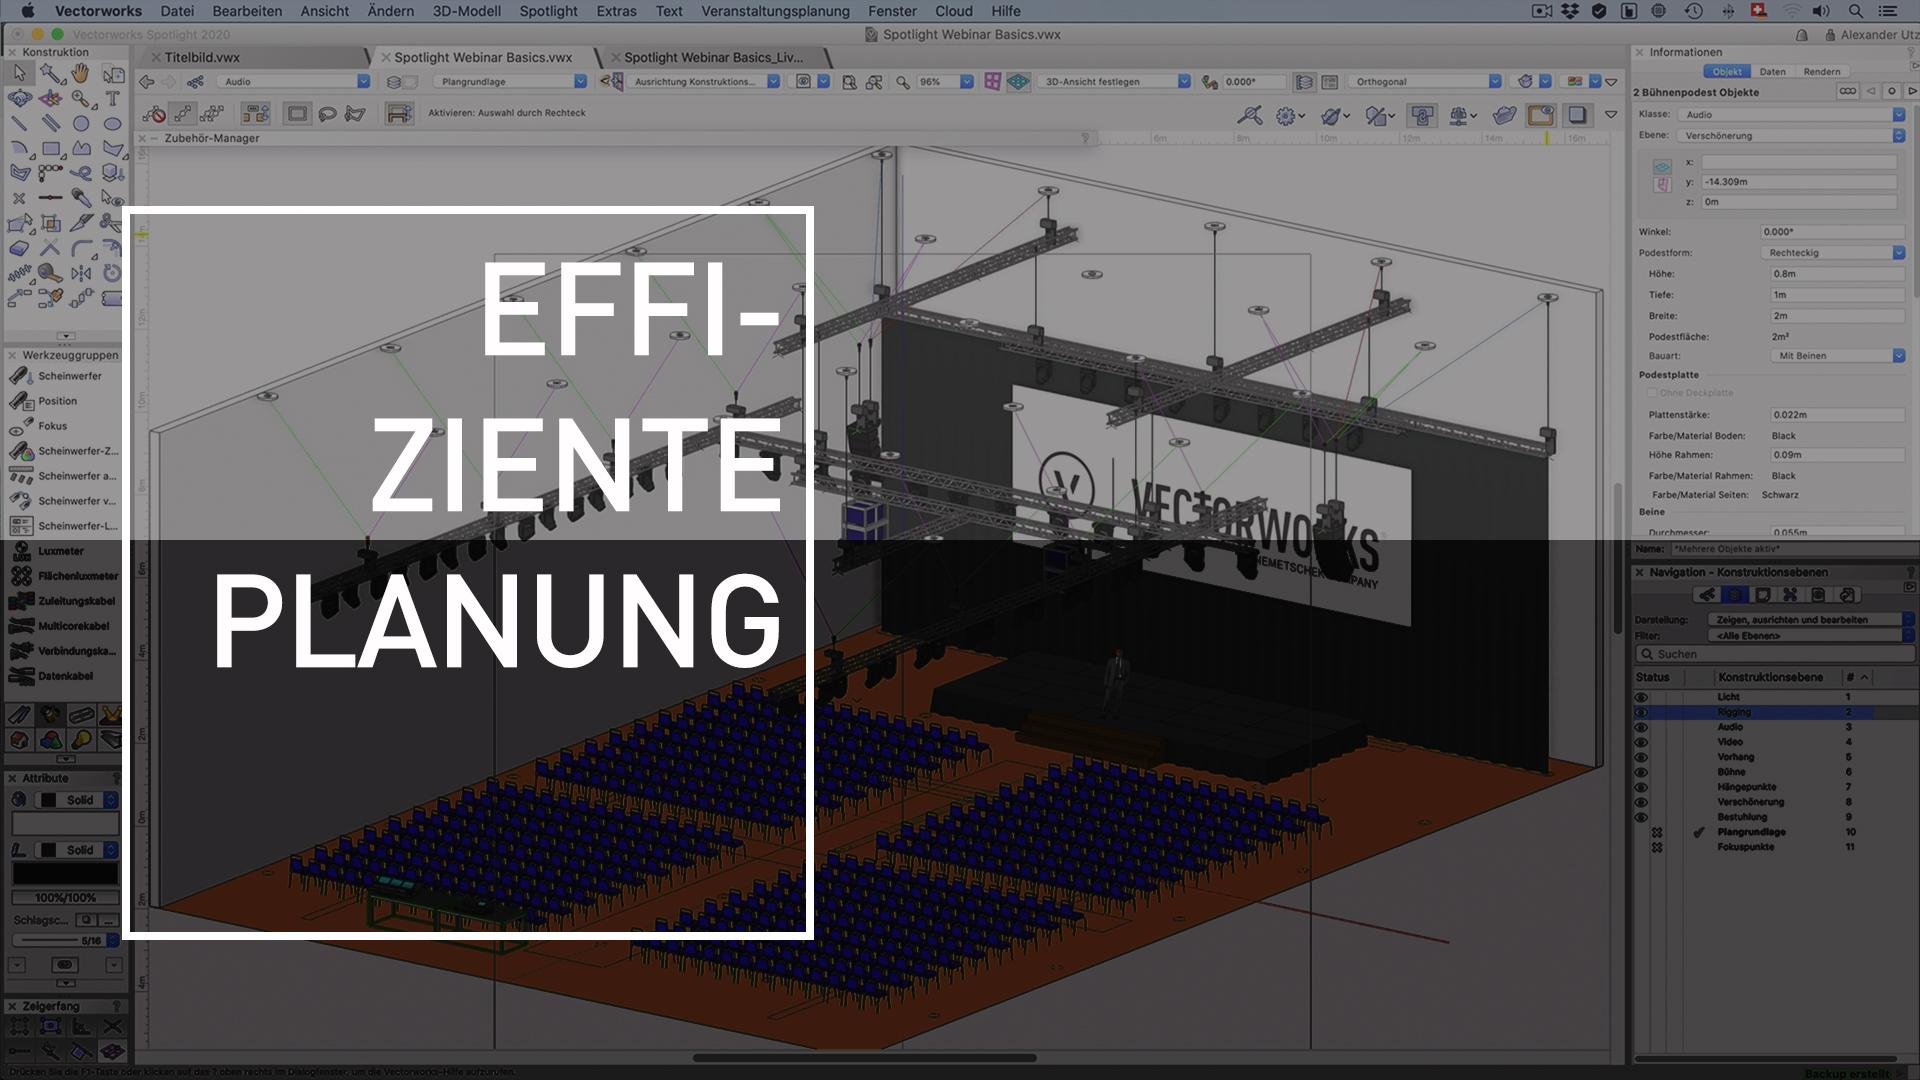 thumbnail-VWSL-webinar-effiziente-planung-ohne-neu